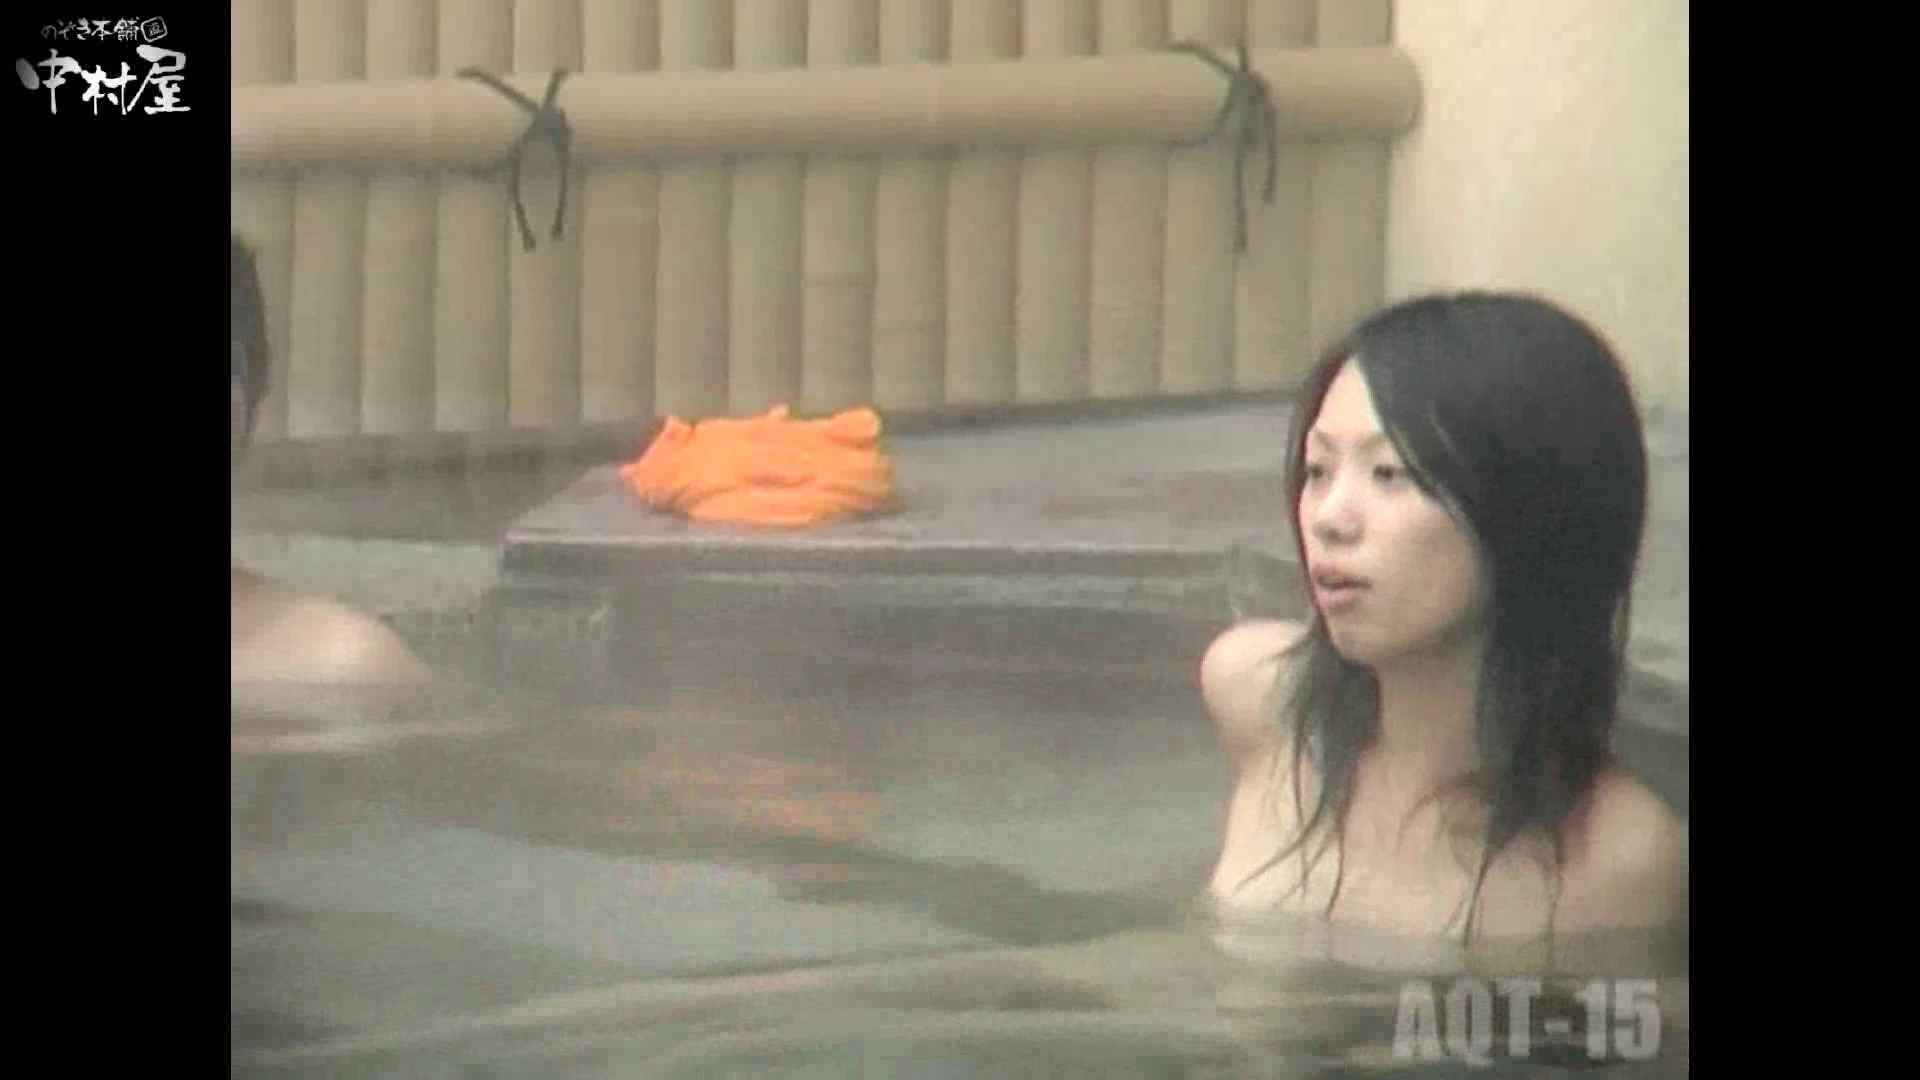 Aquaな露天風呂Vol.878潜入盗撮露天風呂十五判湯 其の八 盗撮 | HなOL  81pic 51